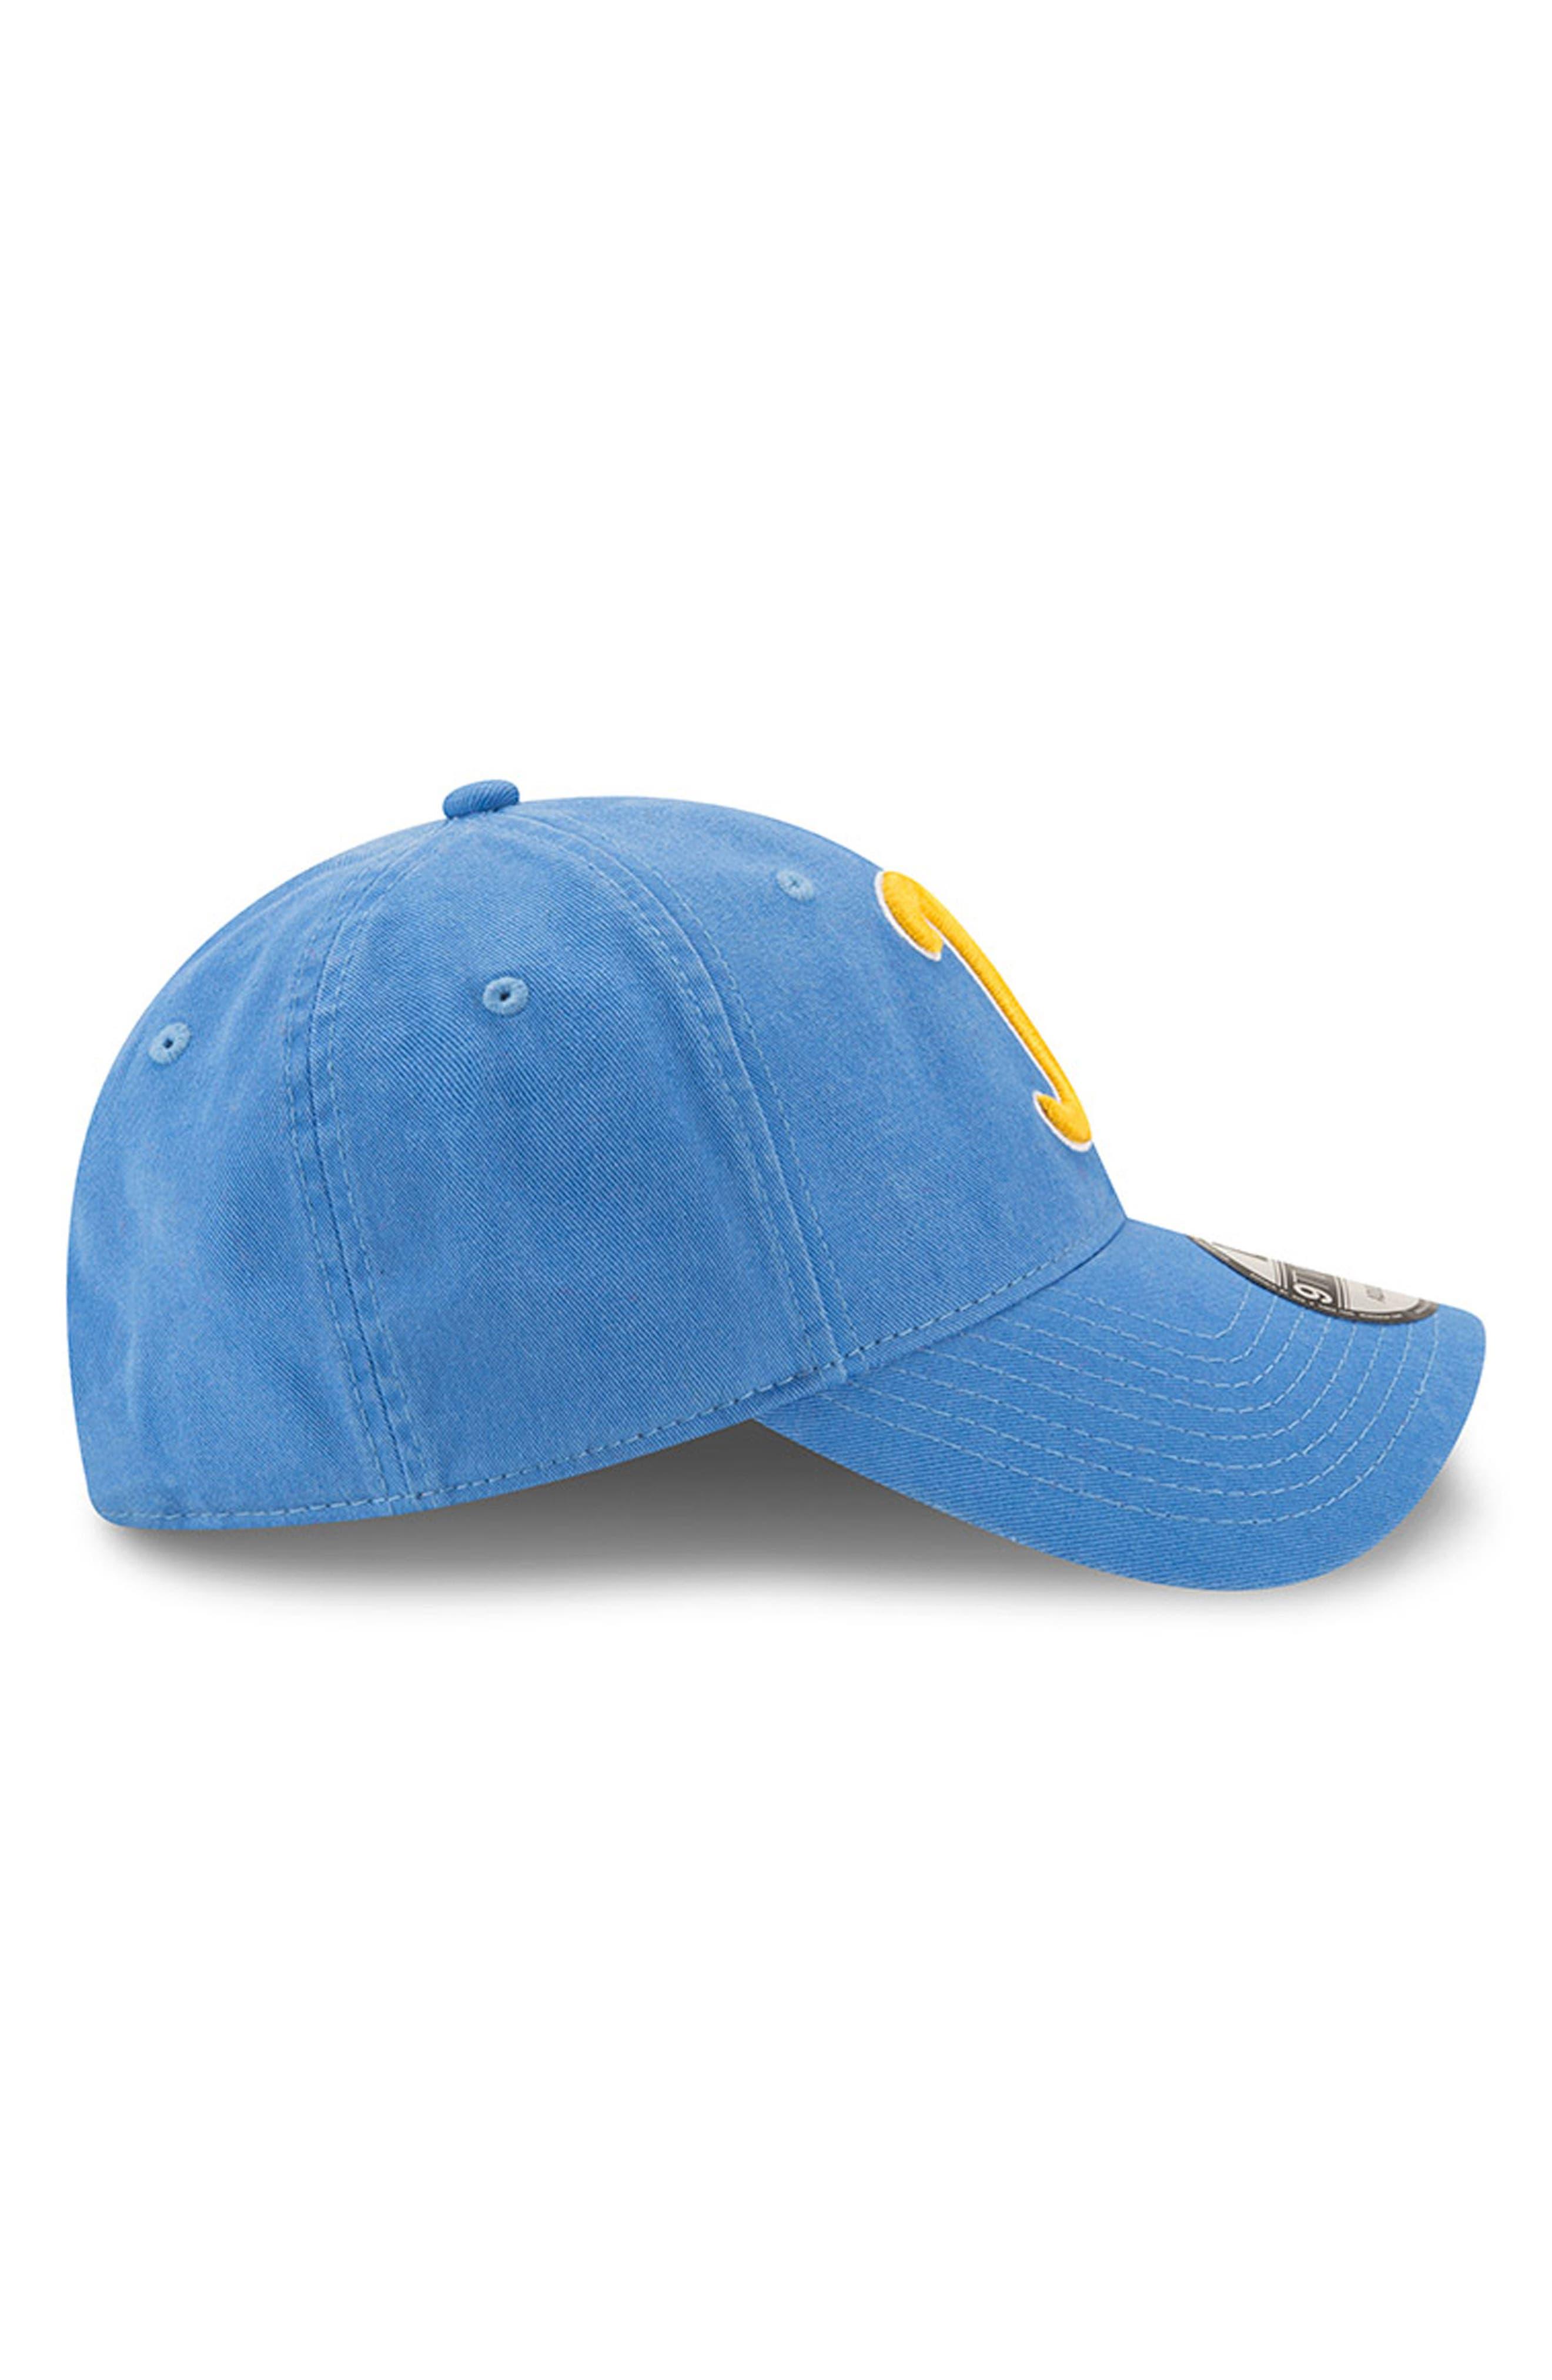 New Era Collegiate Core Classic - UCLA Bruins Baseball Cap,                             Alternate thumbnail 4, color,                             420